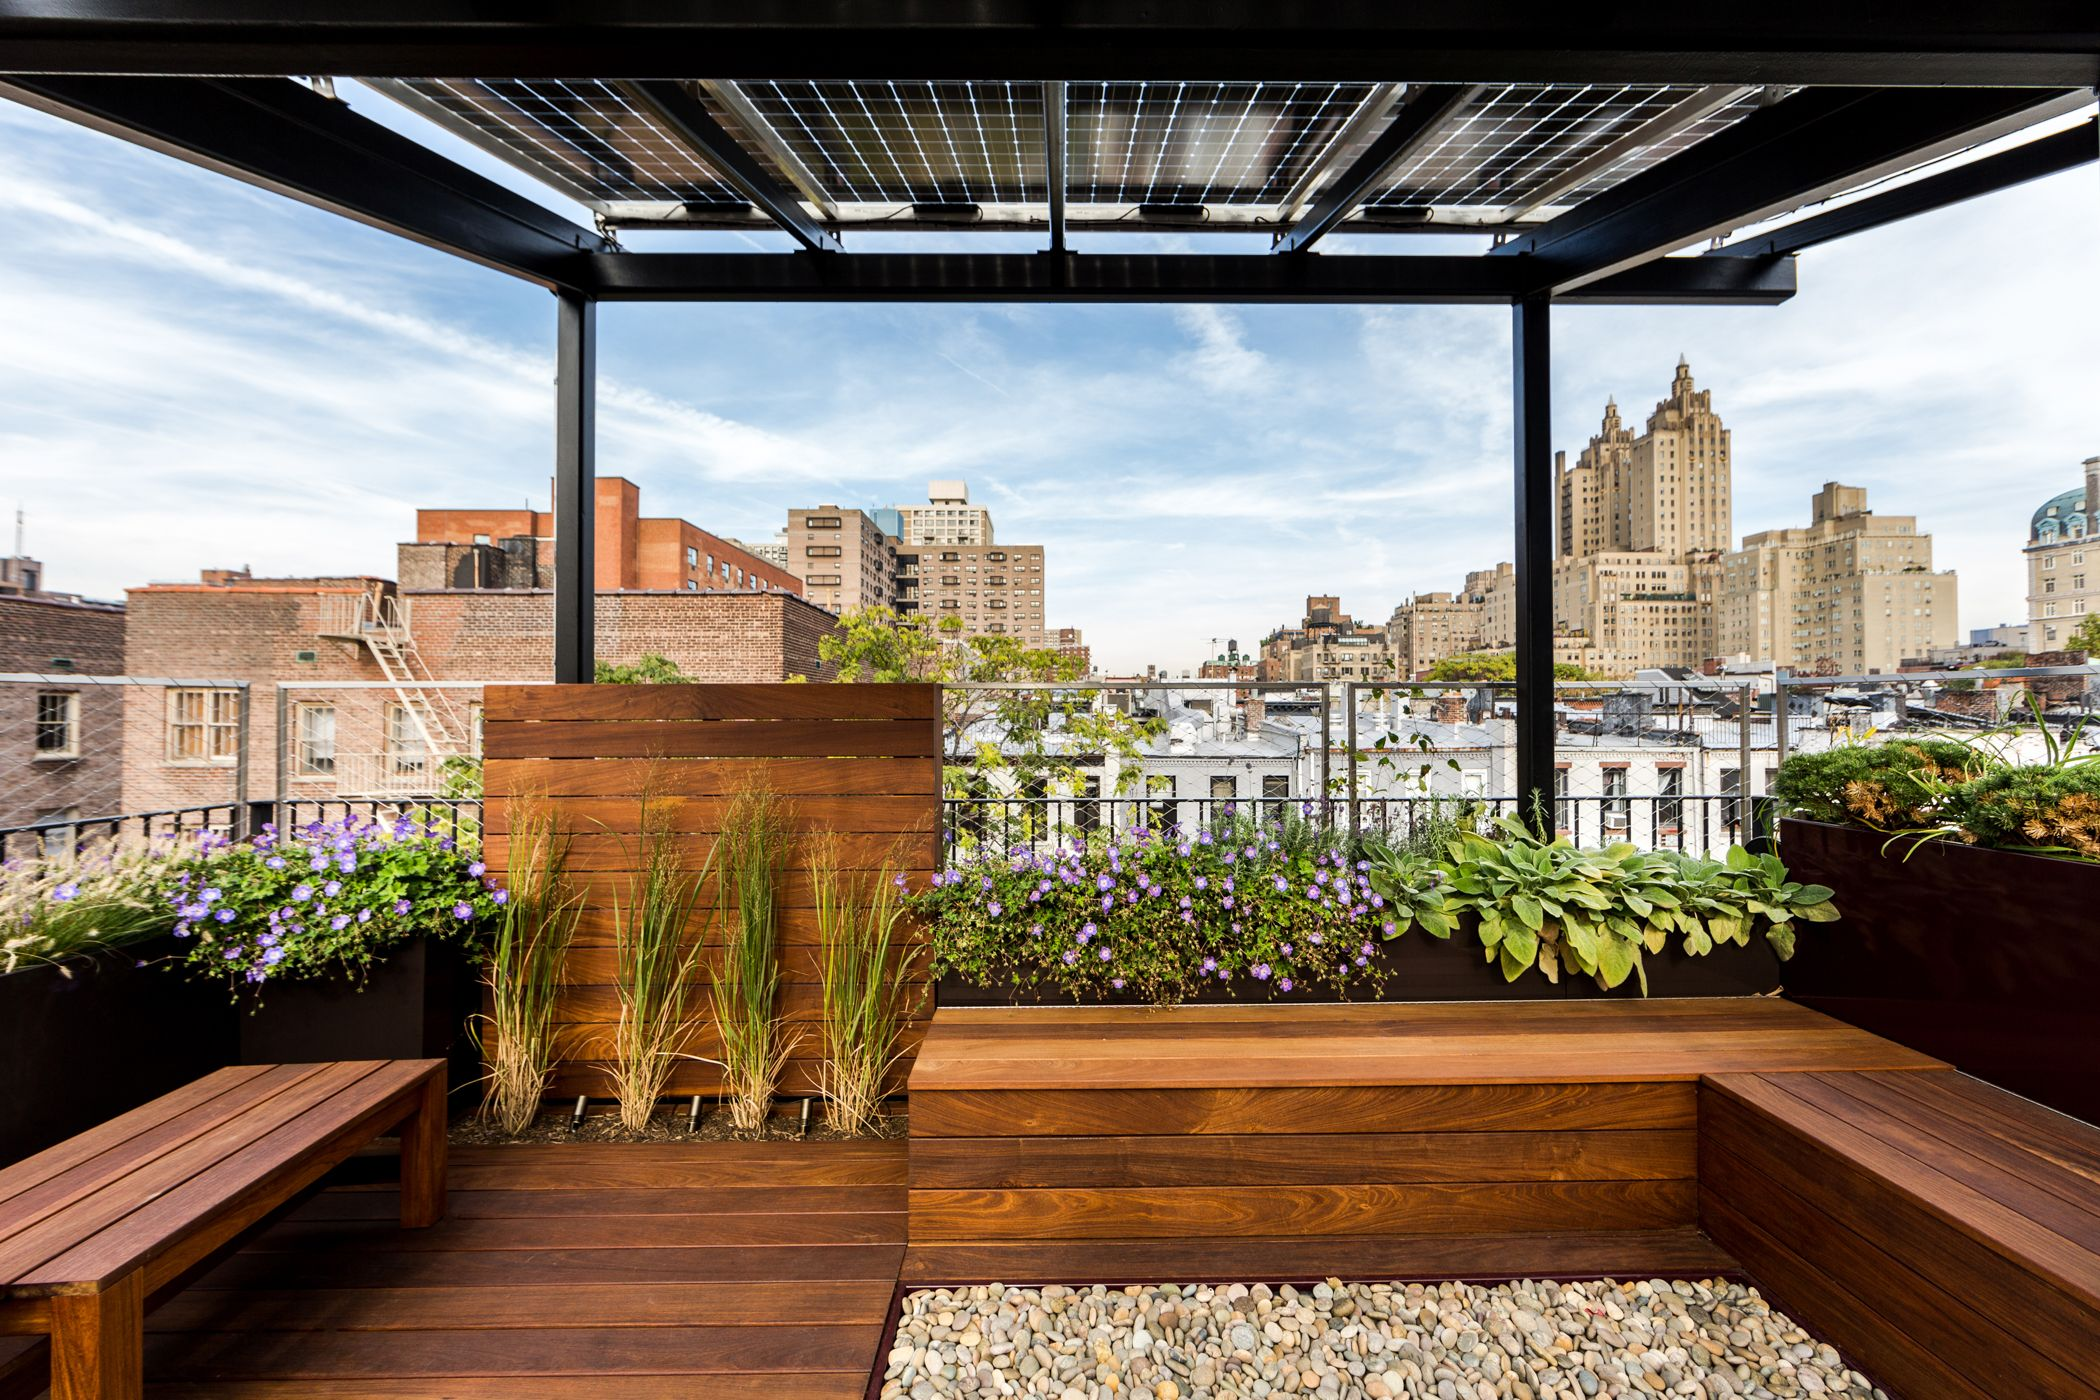 Upper West Side Brownstone Roofgarden